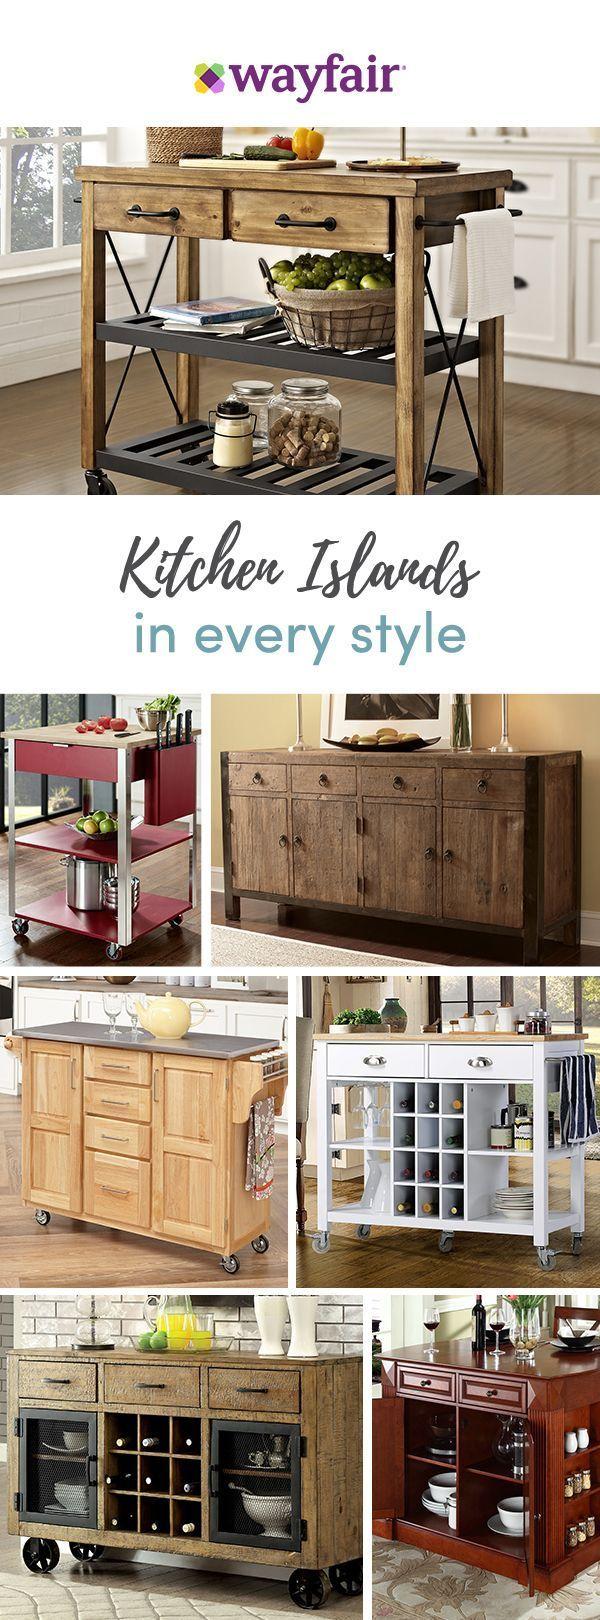 Küchendesign 2018 einfach kitchen countertops ideas photos countertopsideas